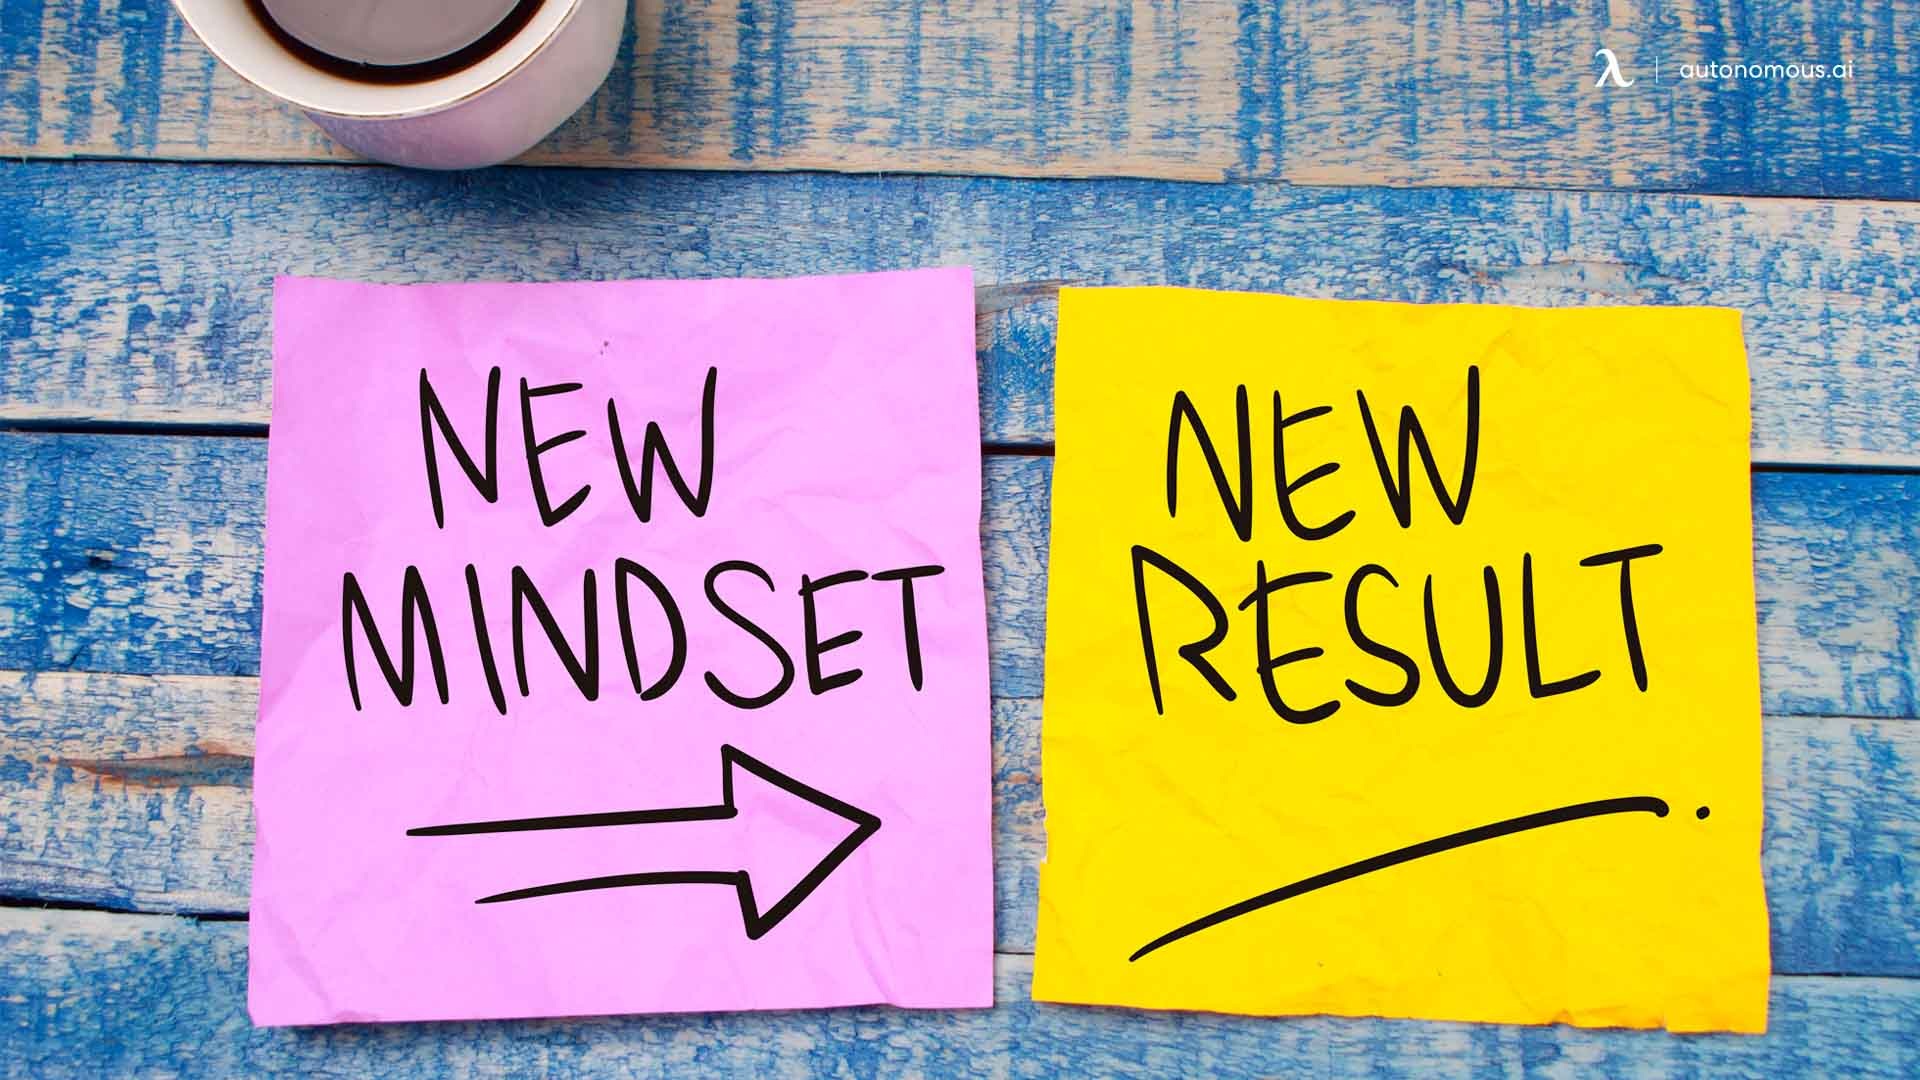 Optimize tasks that you do regularly